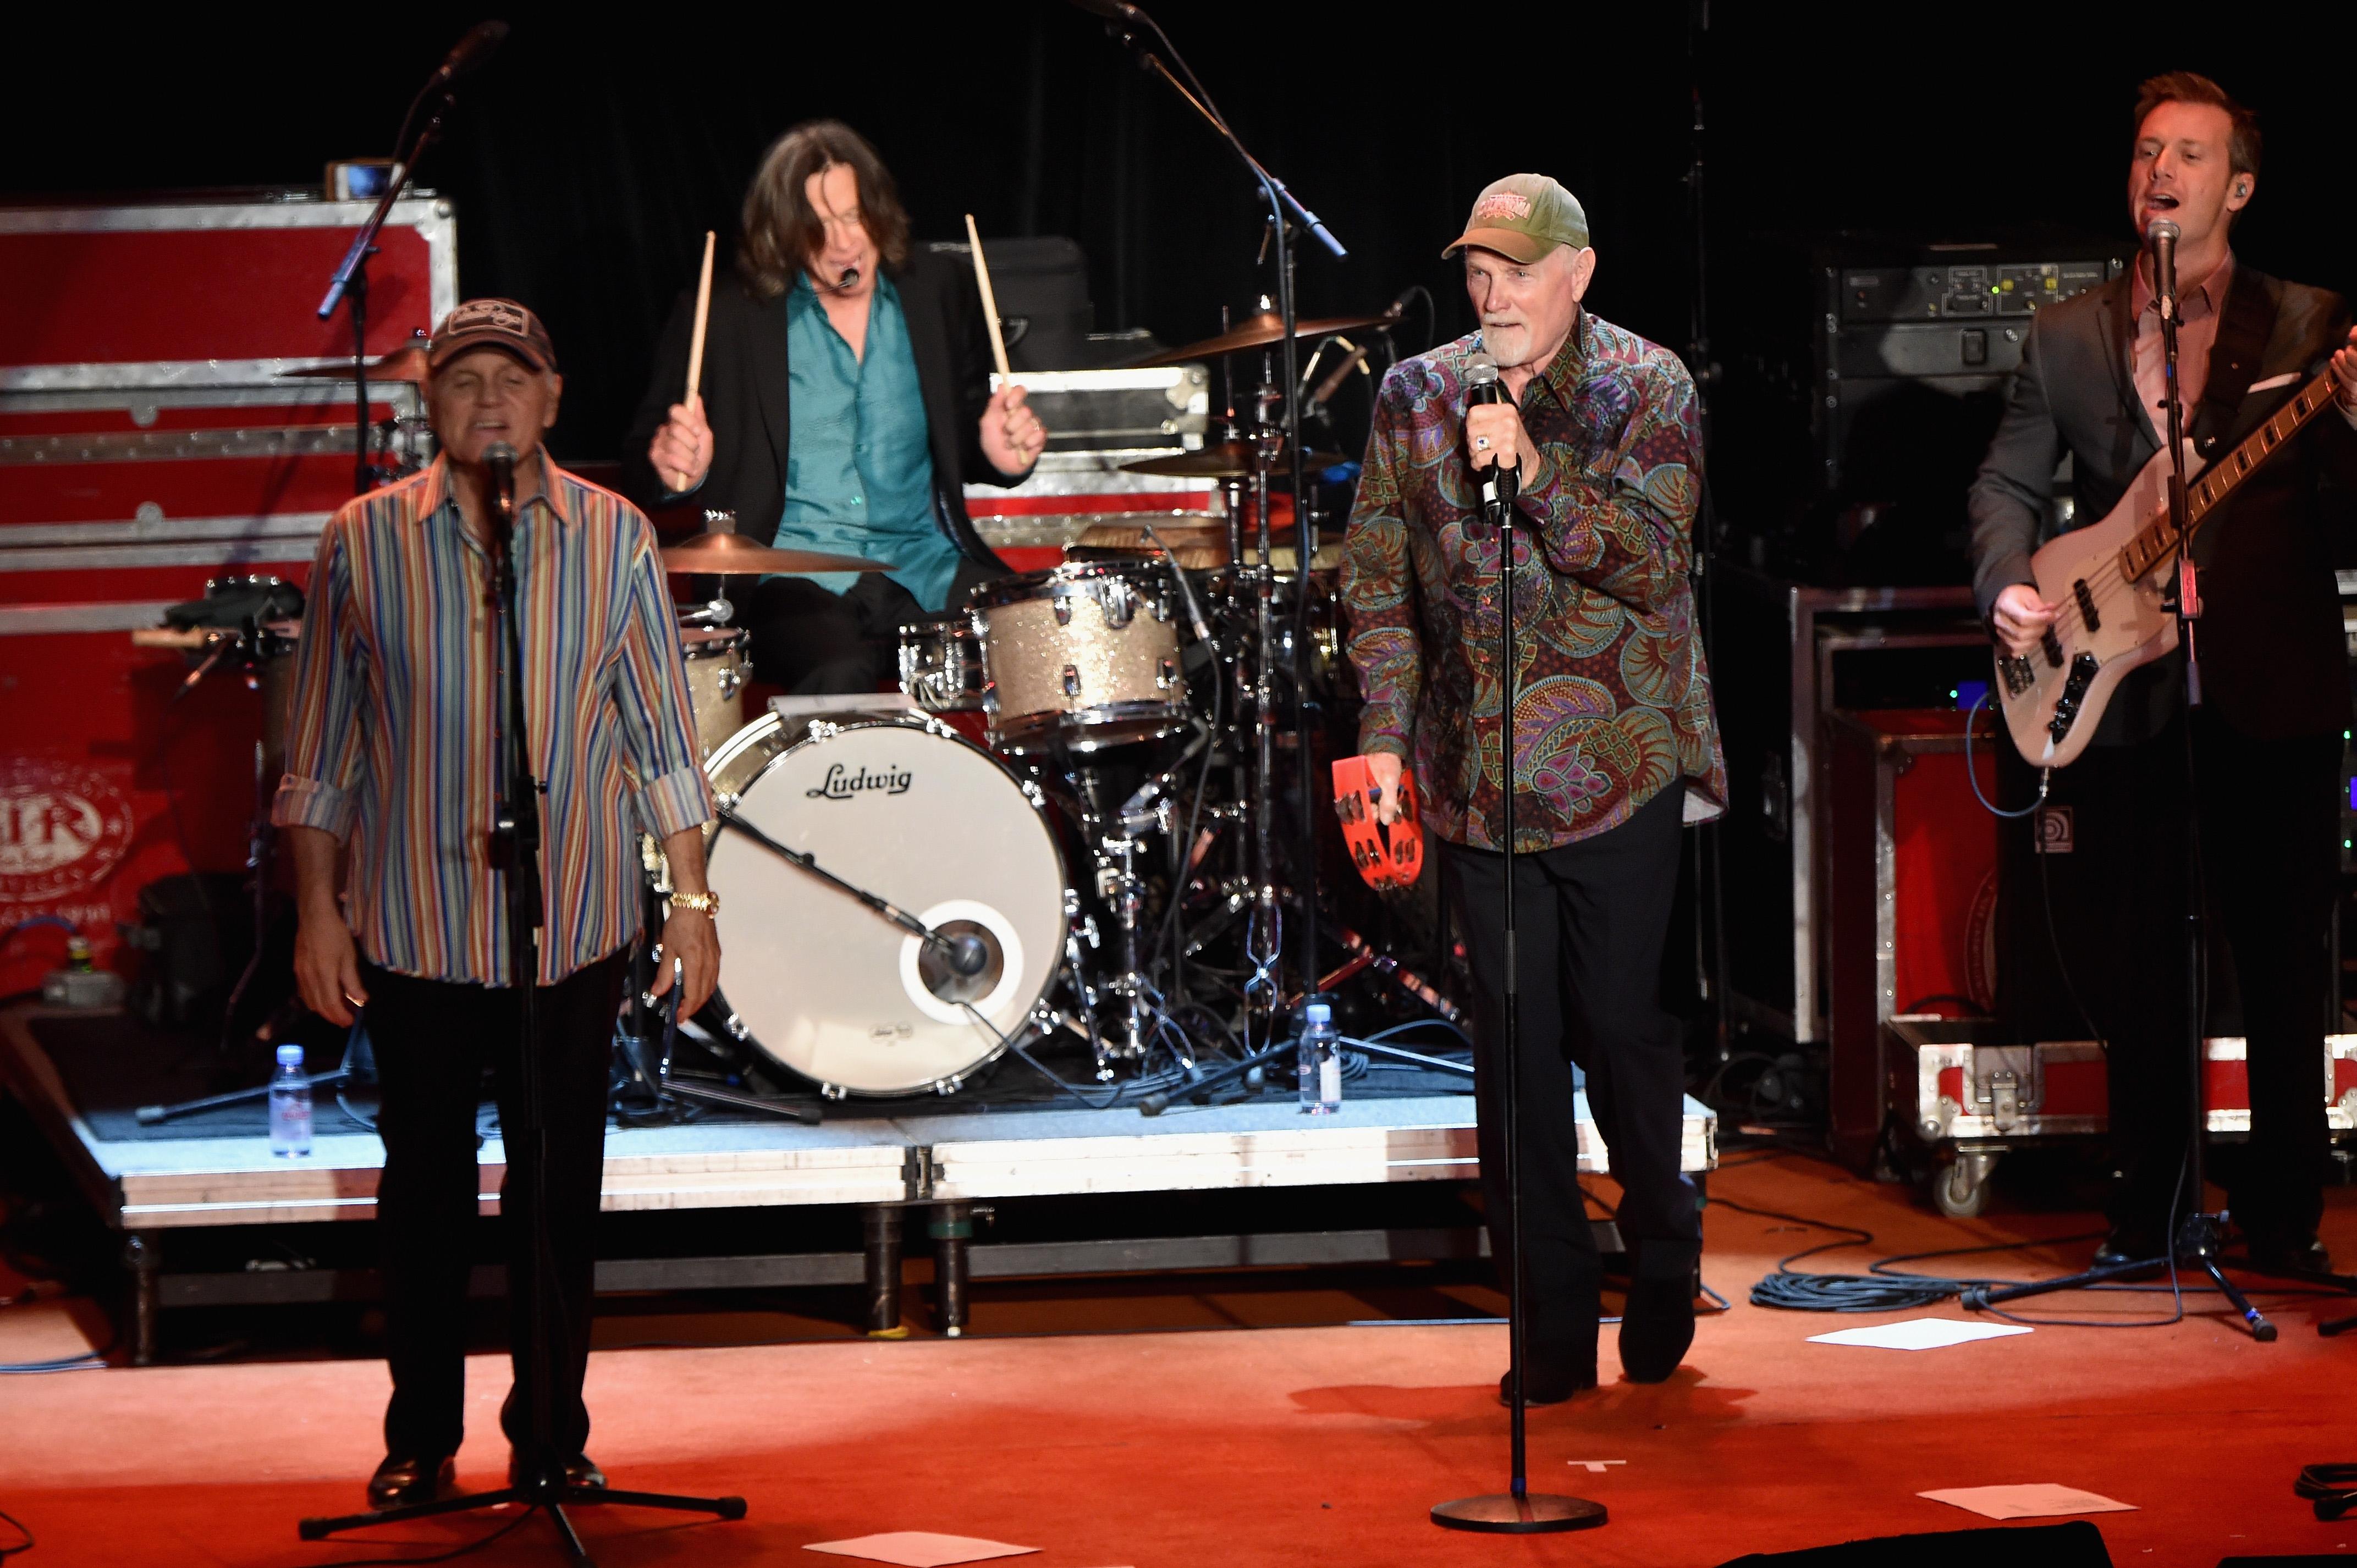 Beach-Boys-To-Headline-Memorial-Day-Concert-In-DC